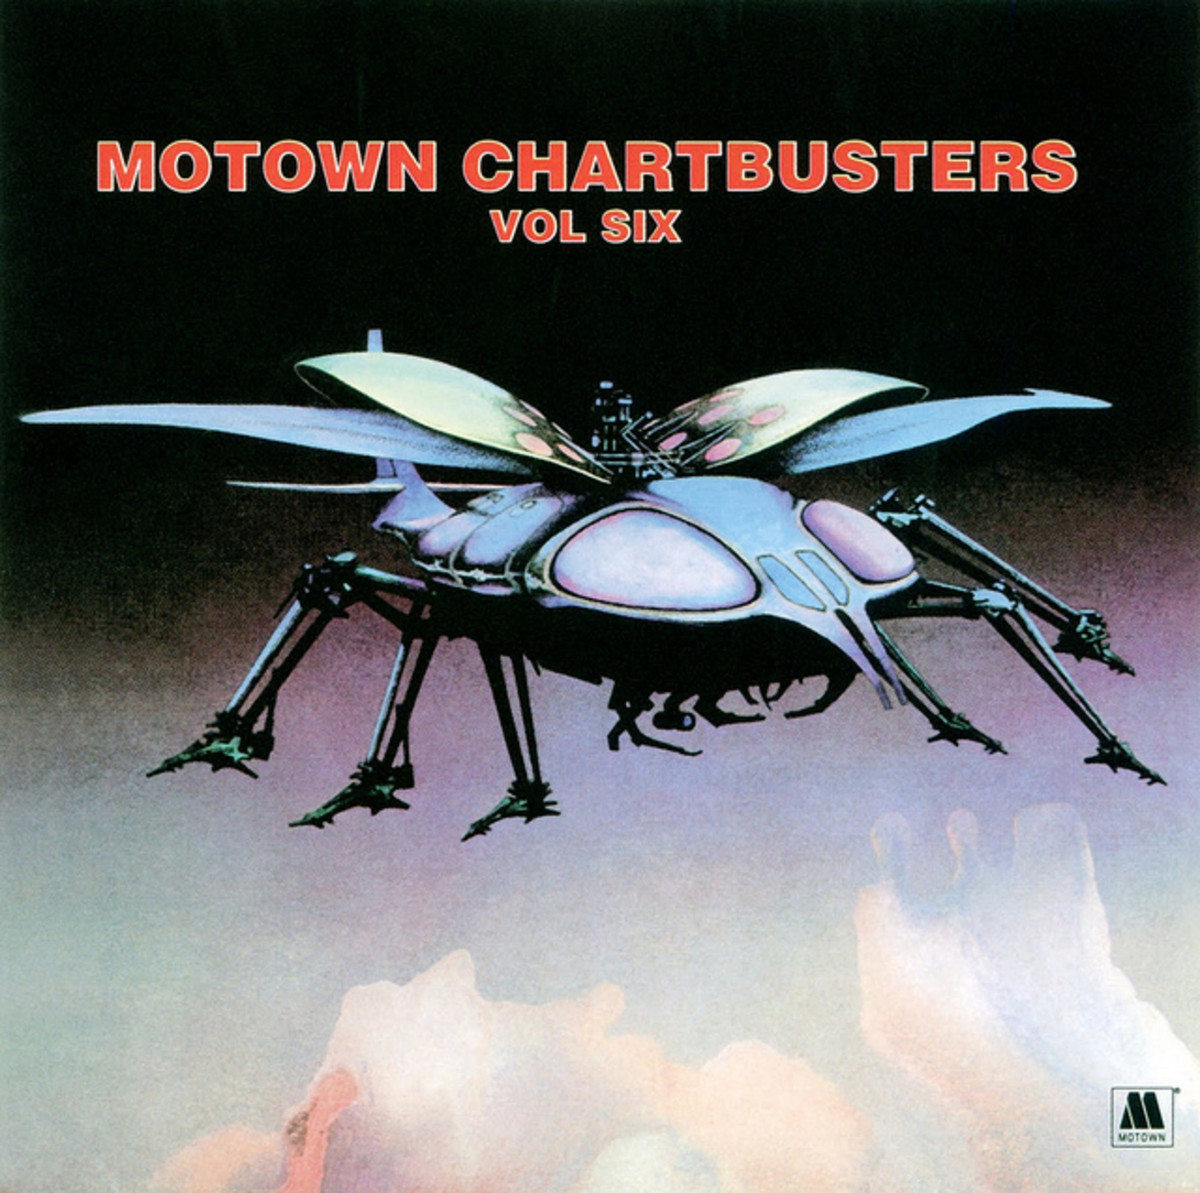 "Various Artists: Motown Chartbusters, Vol. Six Tamala / Motown STML 11191 12"" LP Vinyl Record, US Pressing (1971) Album Cover Art & Design by Roger Dean"